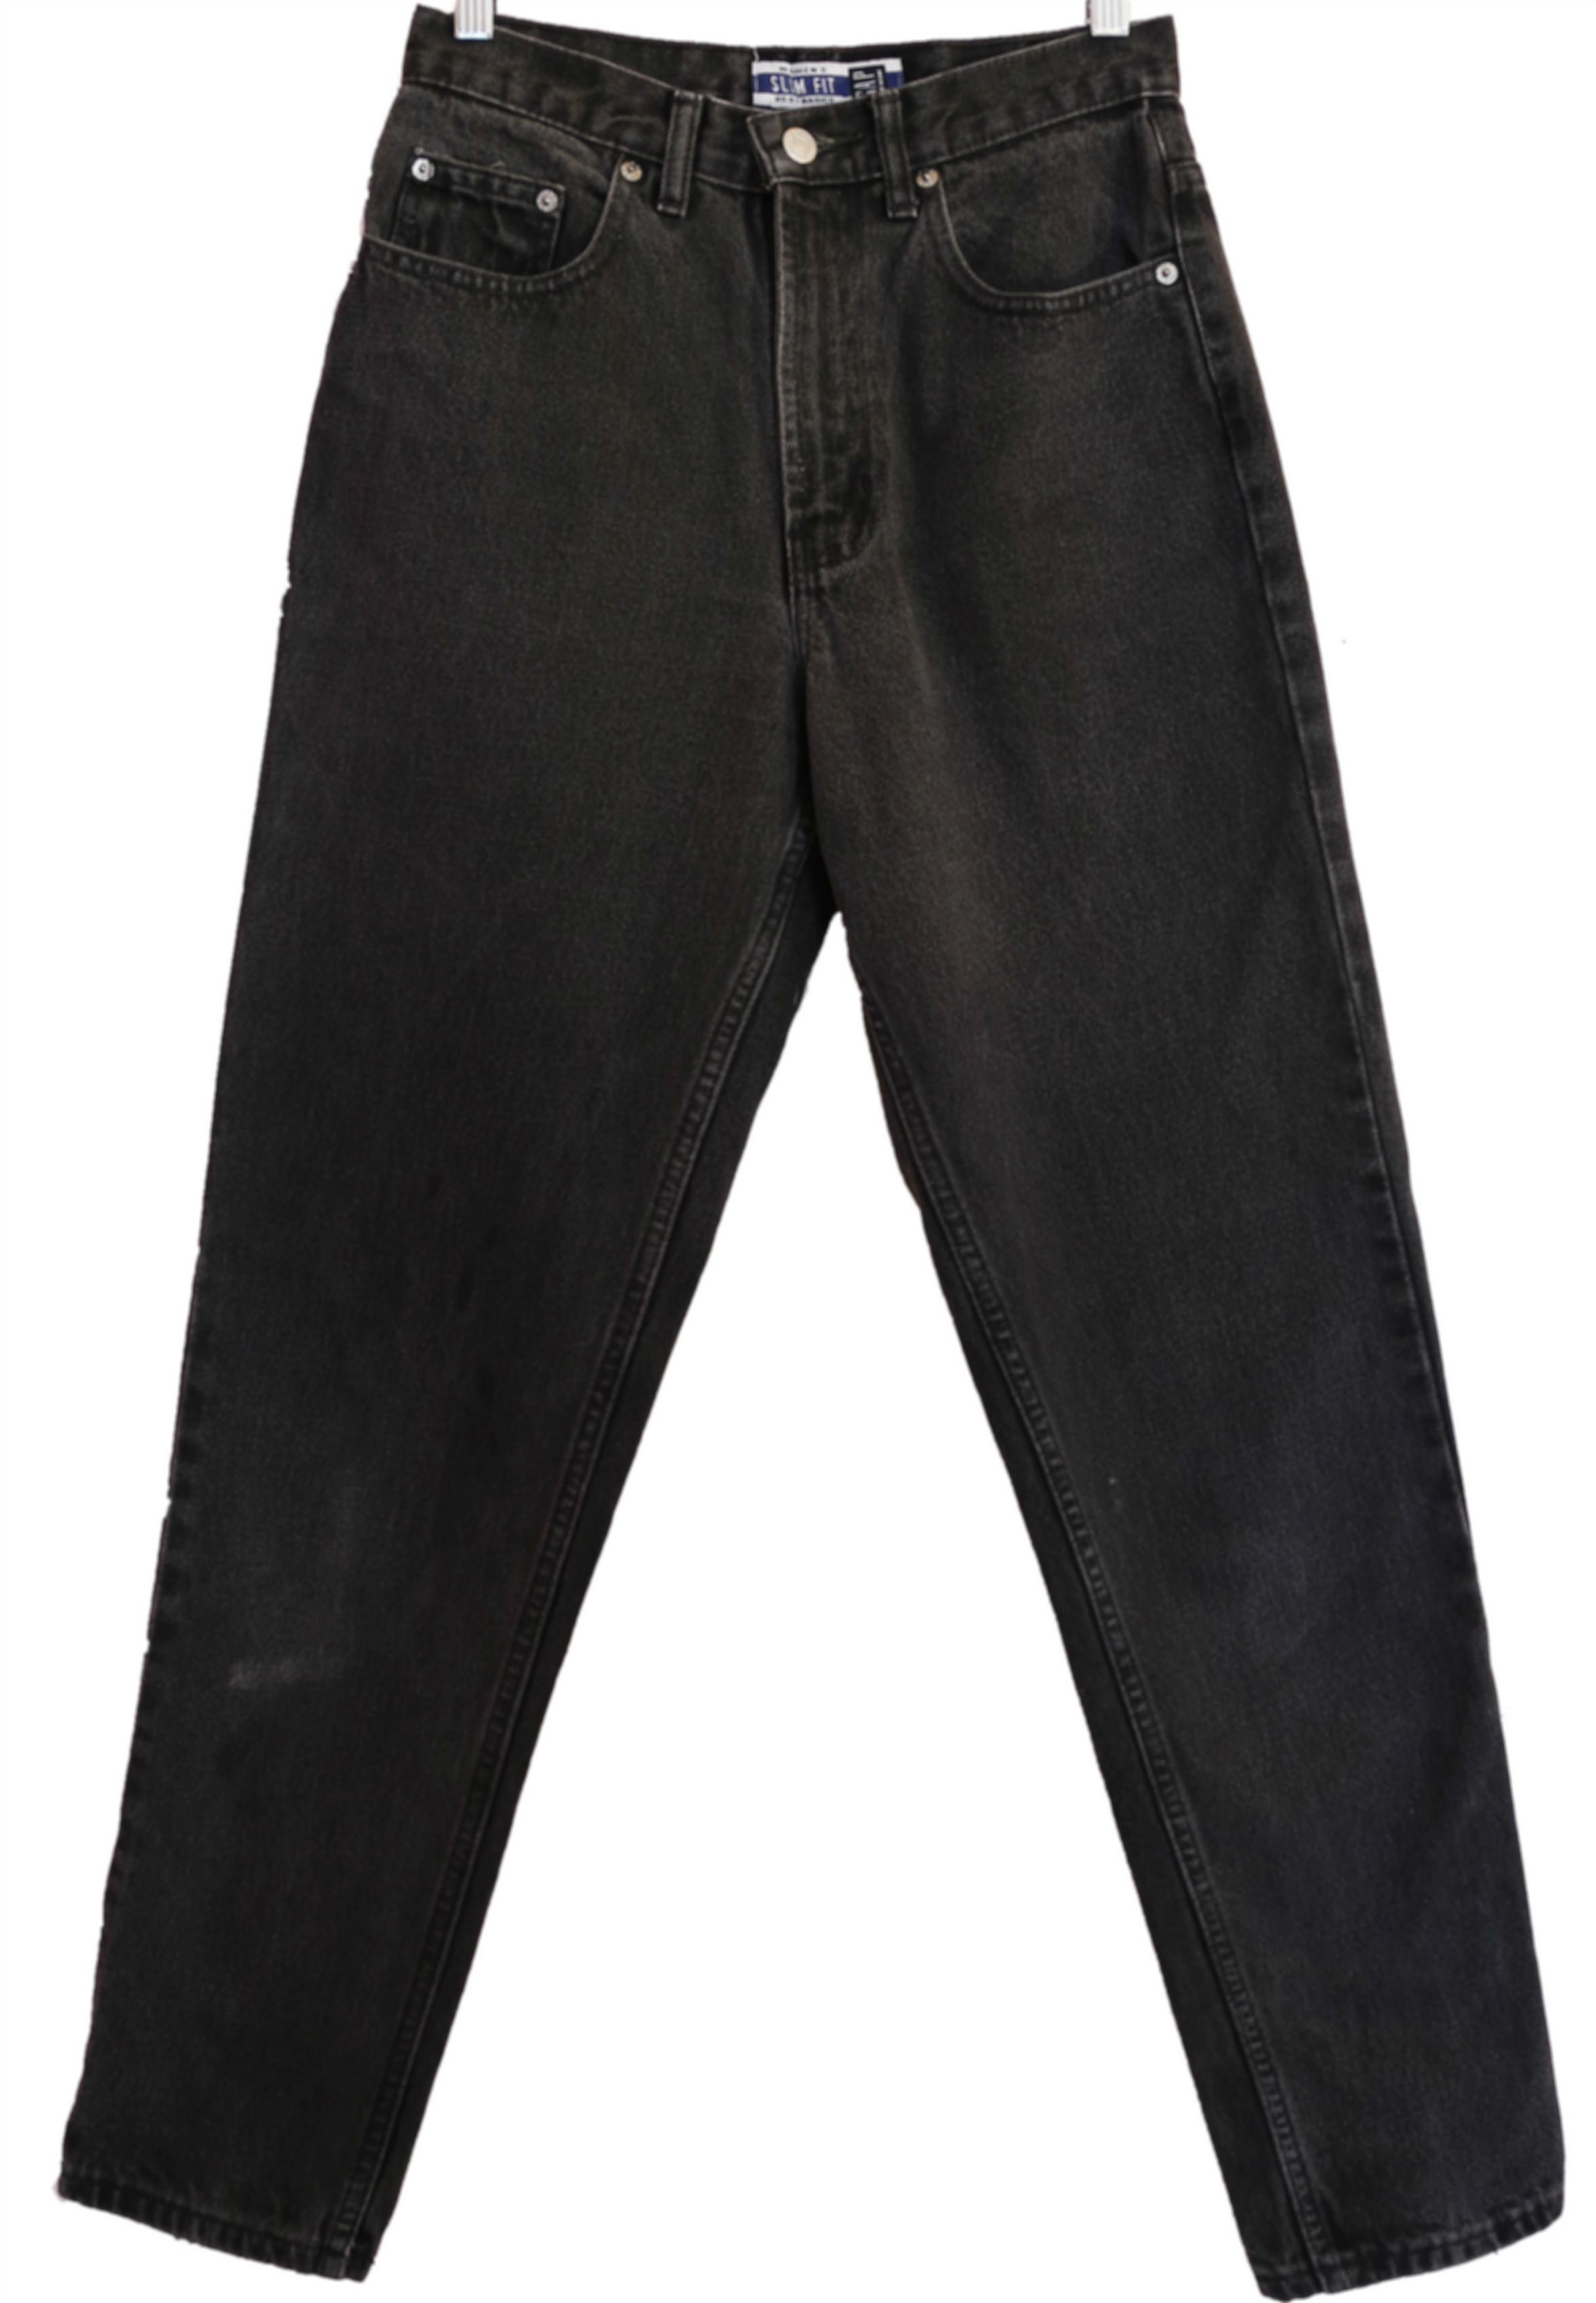 4d99071bfda Vintage Gap Black High-waist Jeans (Size 6) · mod maya · Online ...